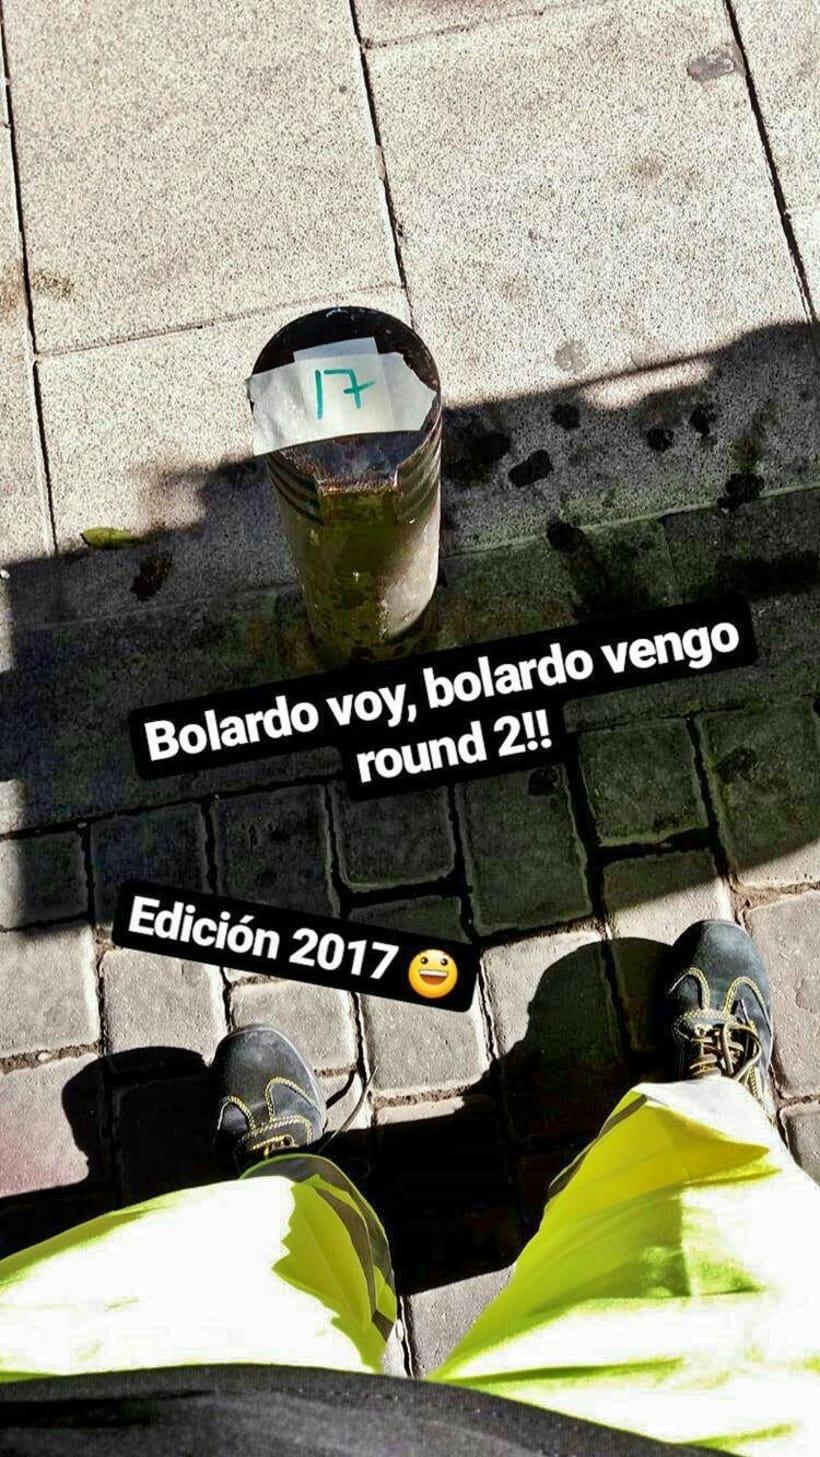 Bolardo voy, bolardo vengo (2017) 0